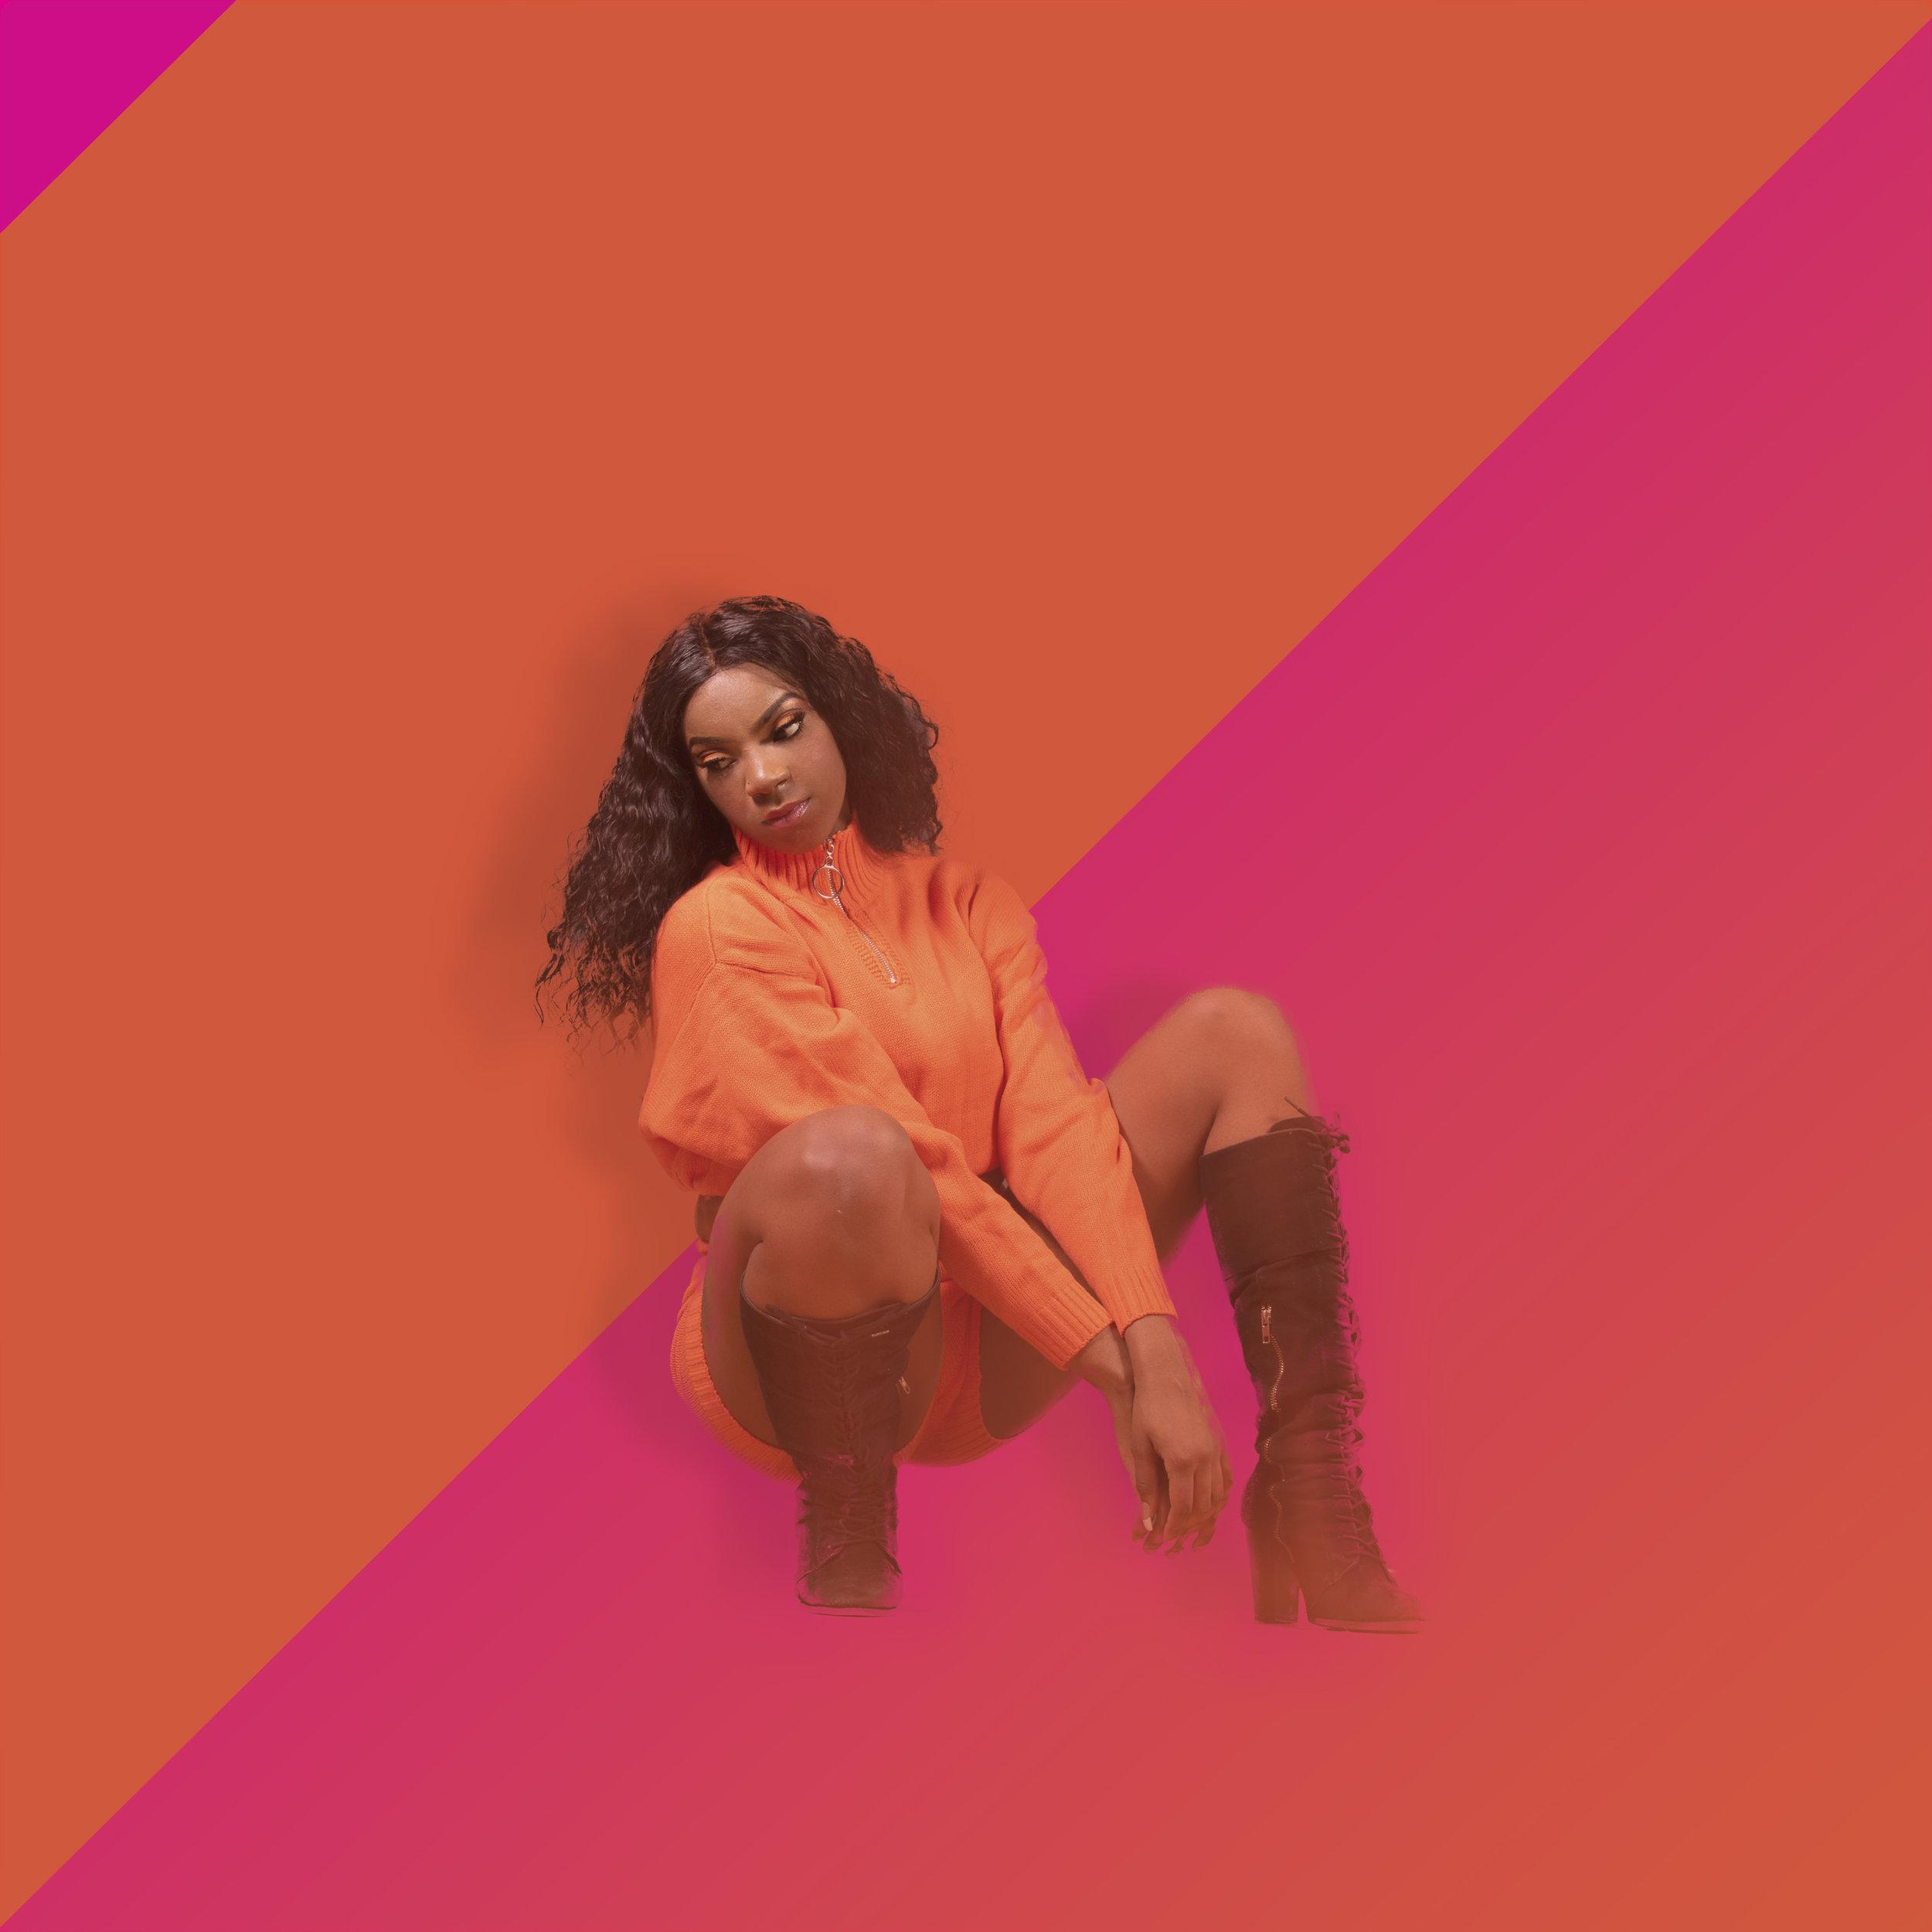 Orangepop.jpg